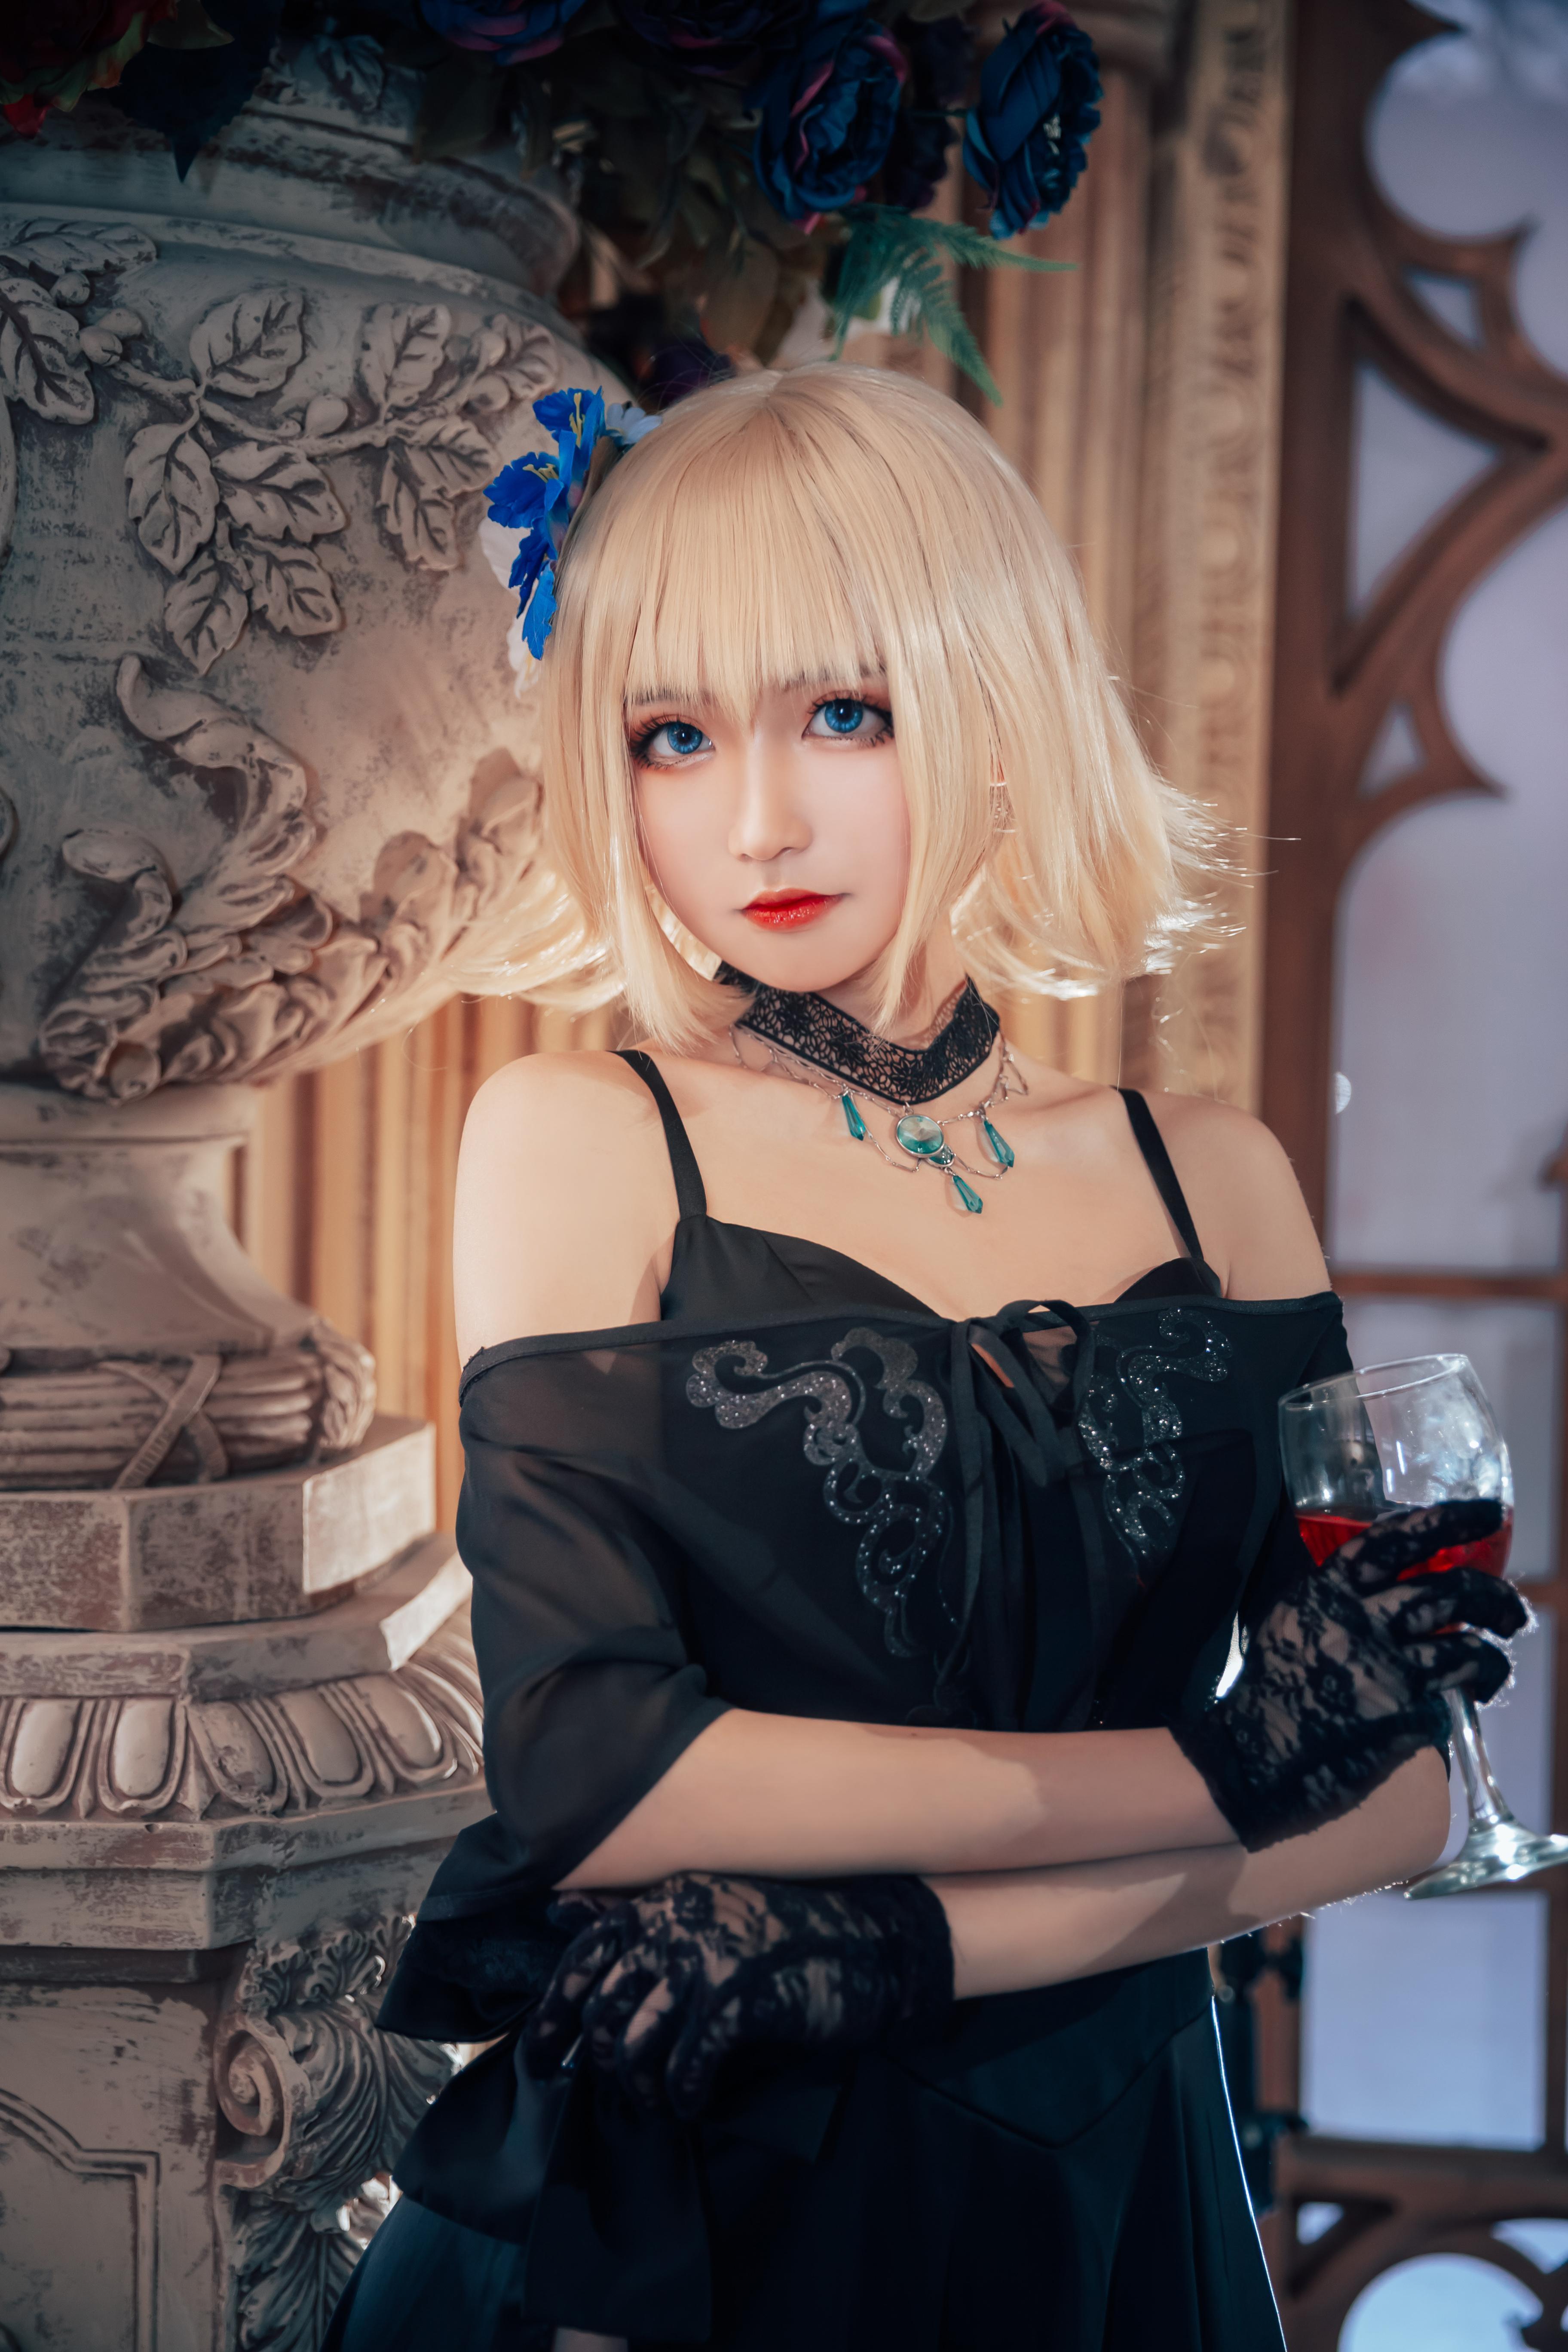 《FATE/GRAND ORDER》正片cosplay【CN:泡泡_Julia】-第9张